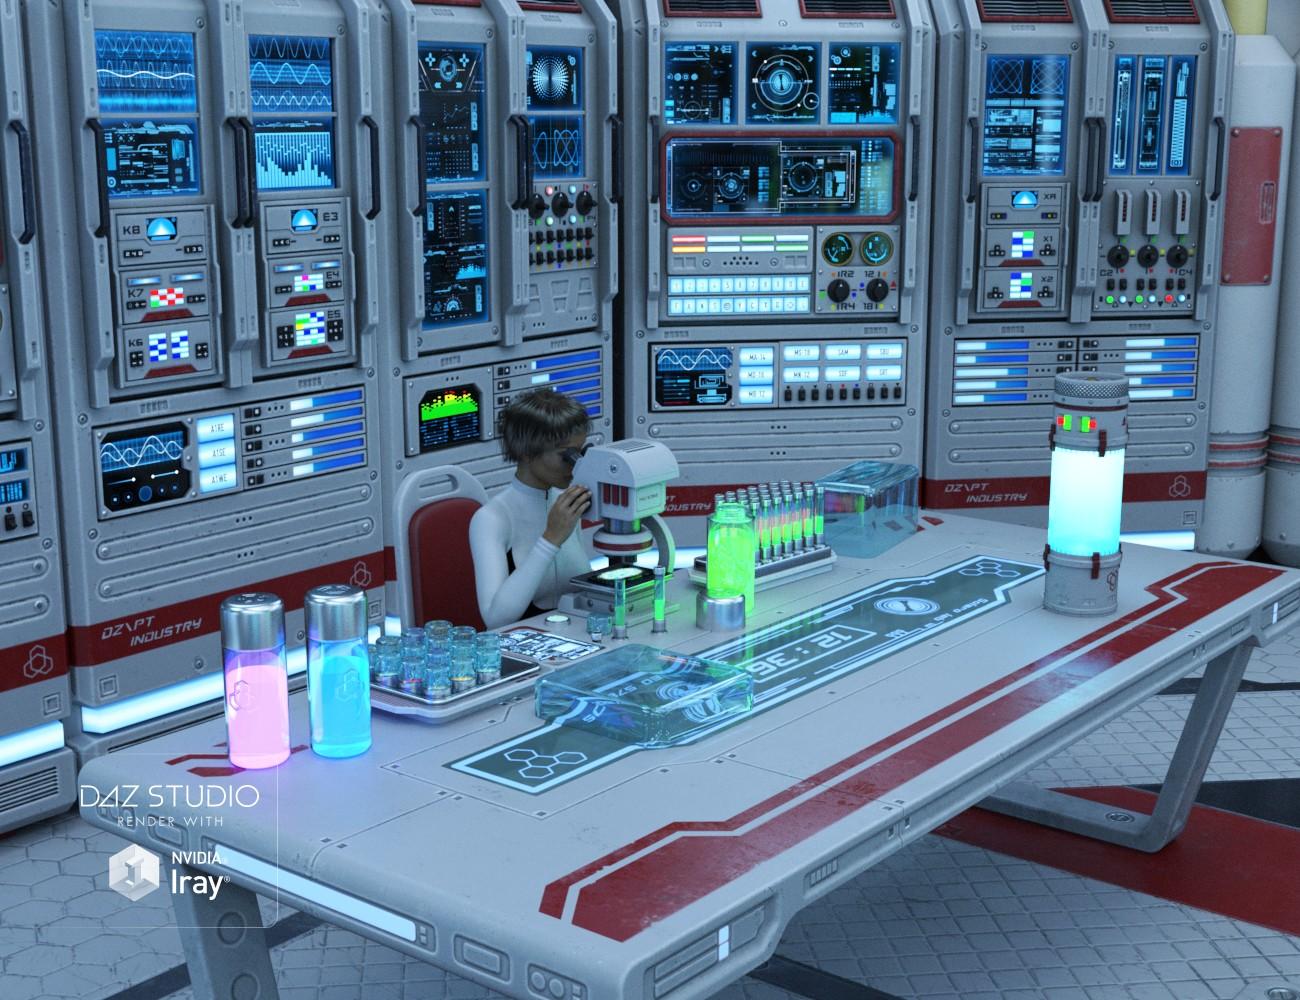 Download Daz Studio 3 For Free Daz 3d Sci Fi Lab Props